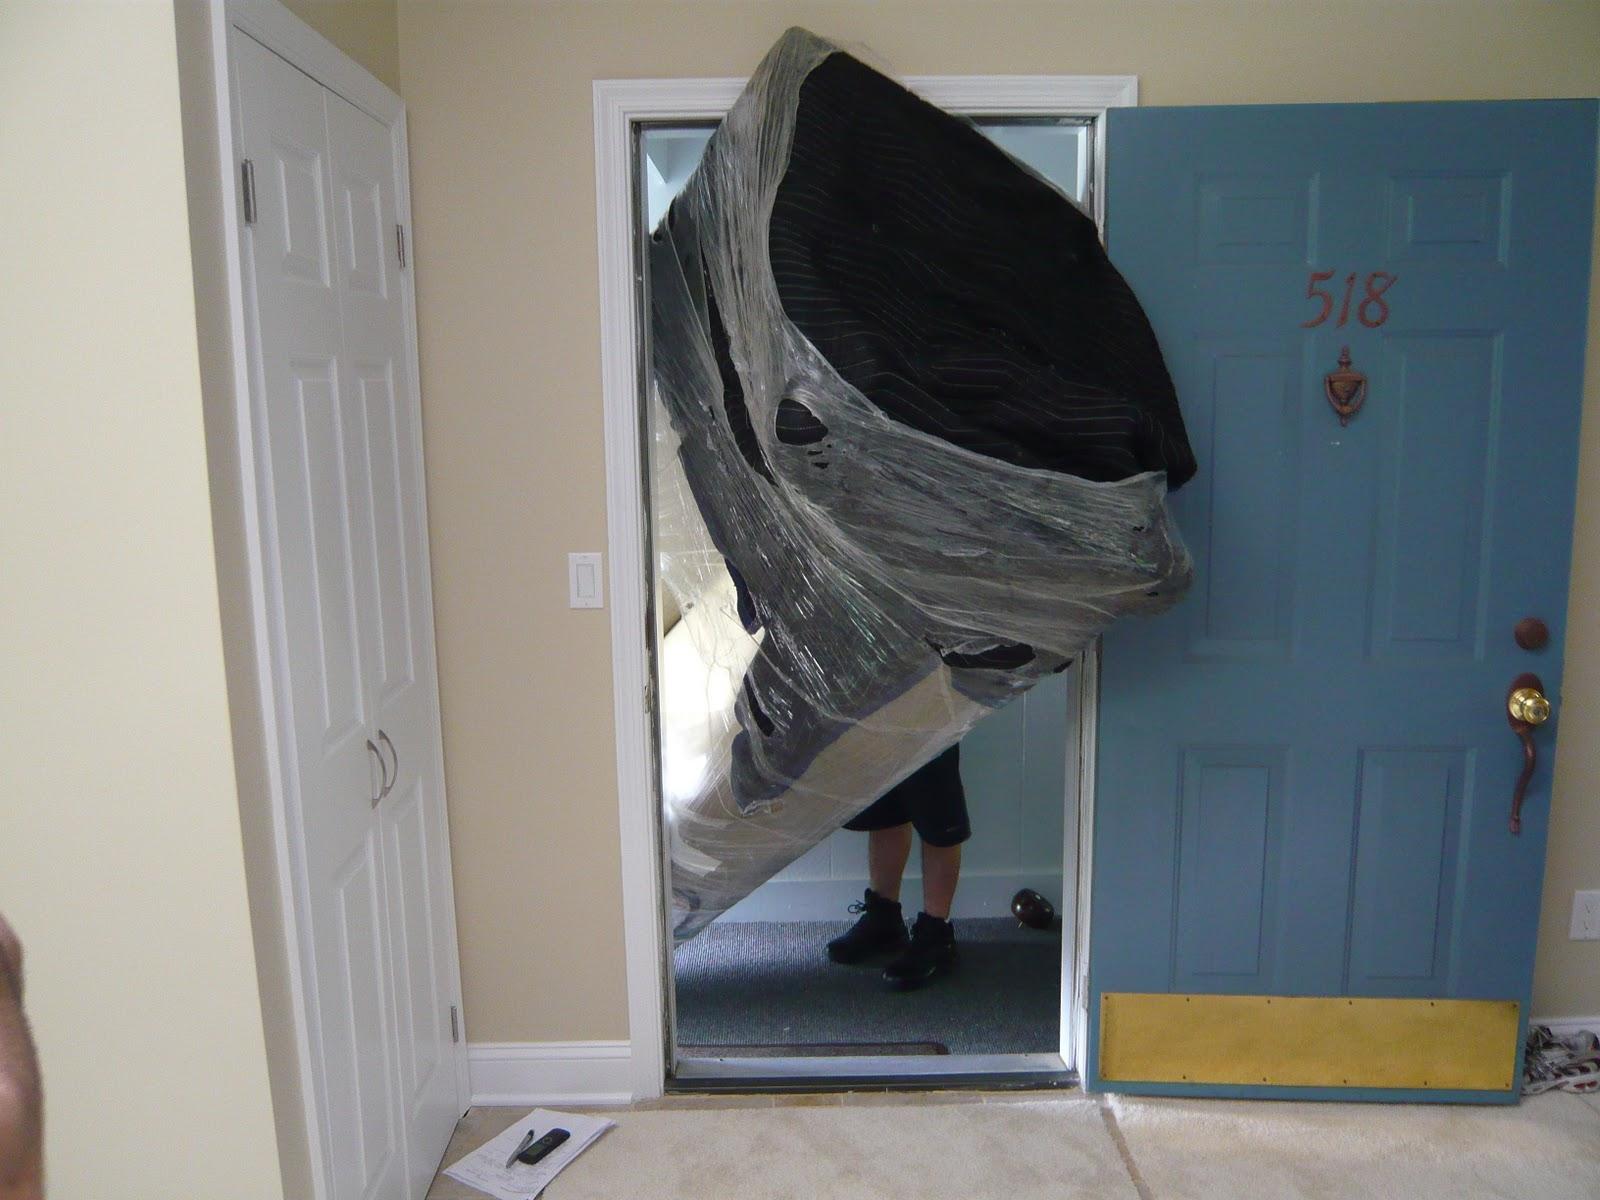 Dr Sofa S Furniture Repair Sofa Disassembly And